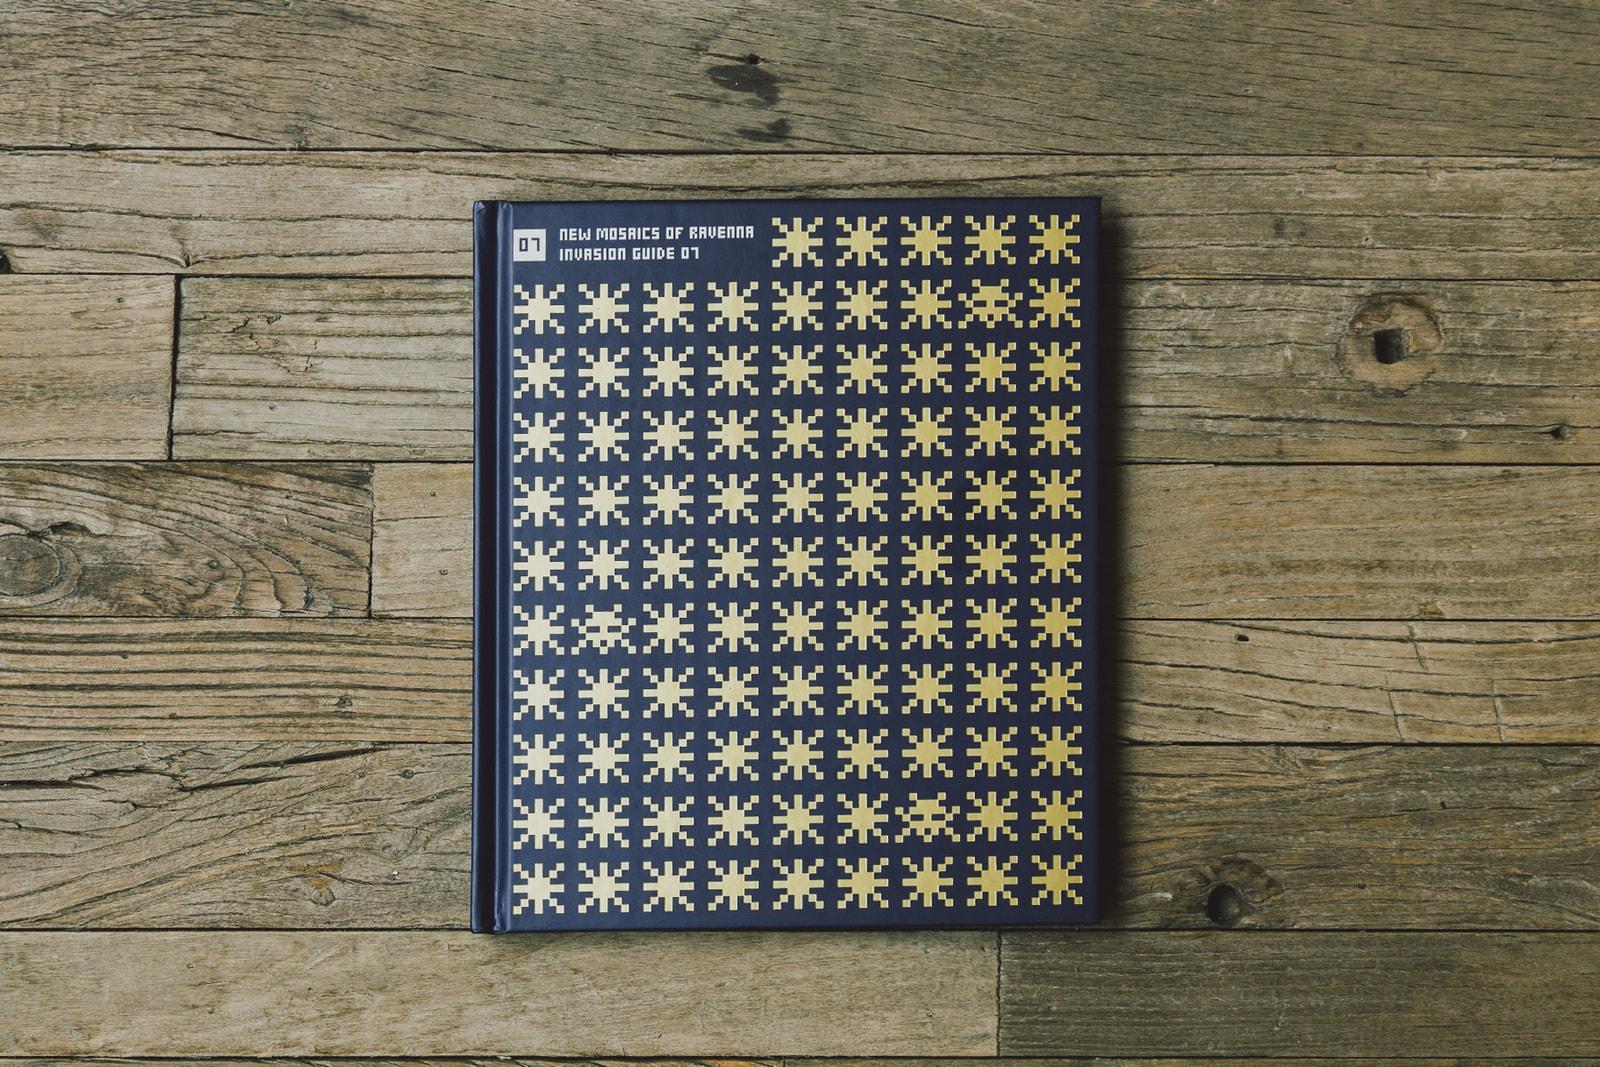 率先欣賞 Invader 全球限量 25 本《New Mosaics of Ravenna》